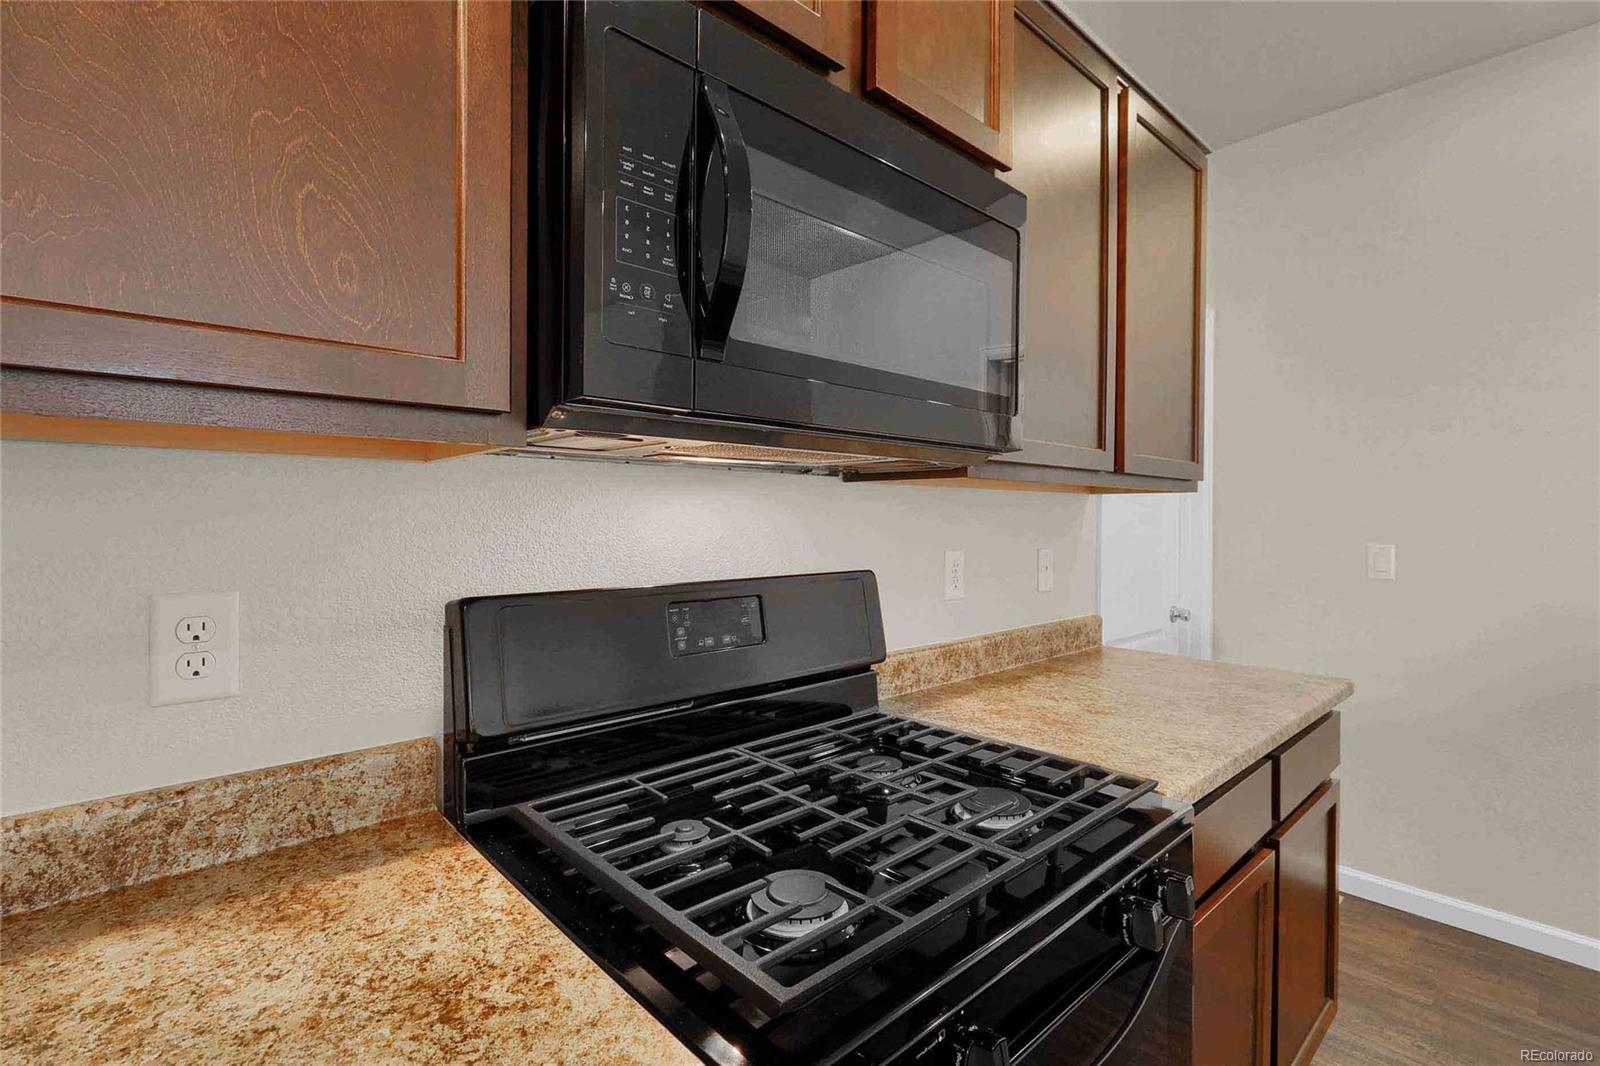 MLS# 5218799 - 6 - 2890 Urban Place, Berthoud, CO 80513